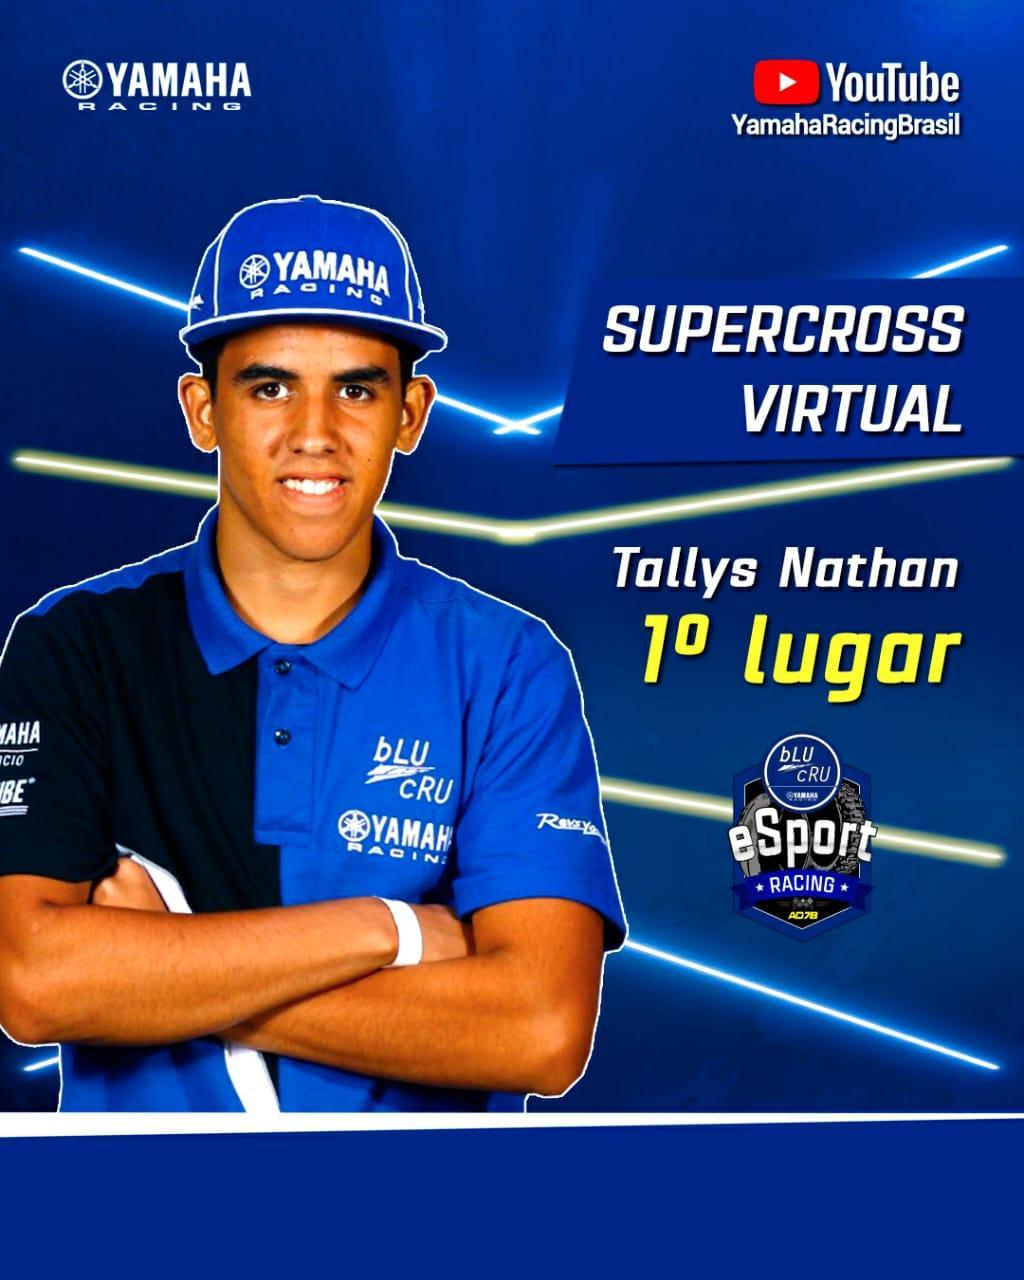 Tallys Nathan vence disputa de Supercross virtual